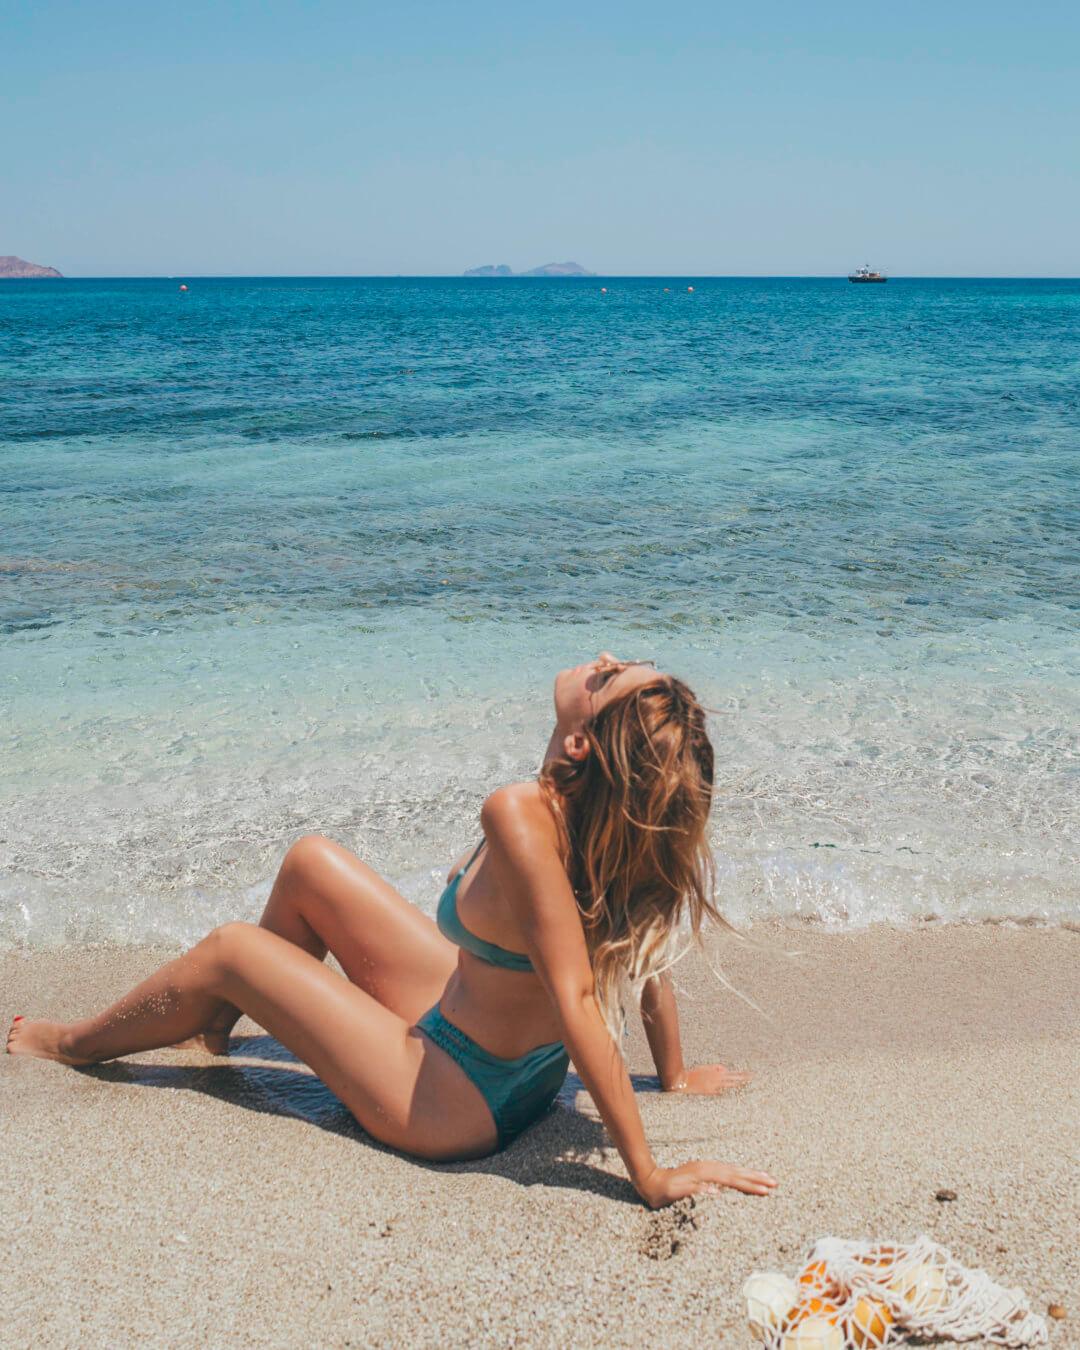 Summer Essentials: What's In My Beach Bag